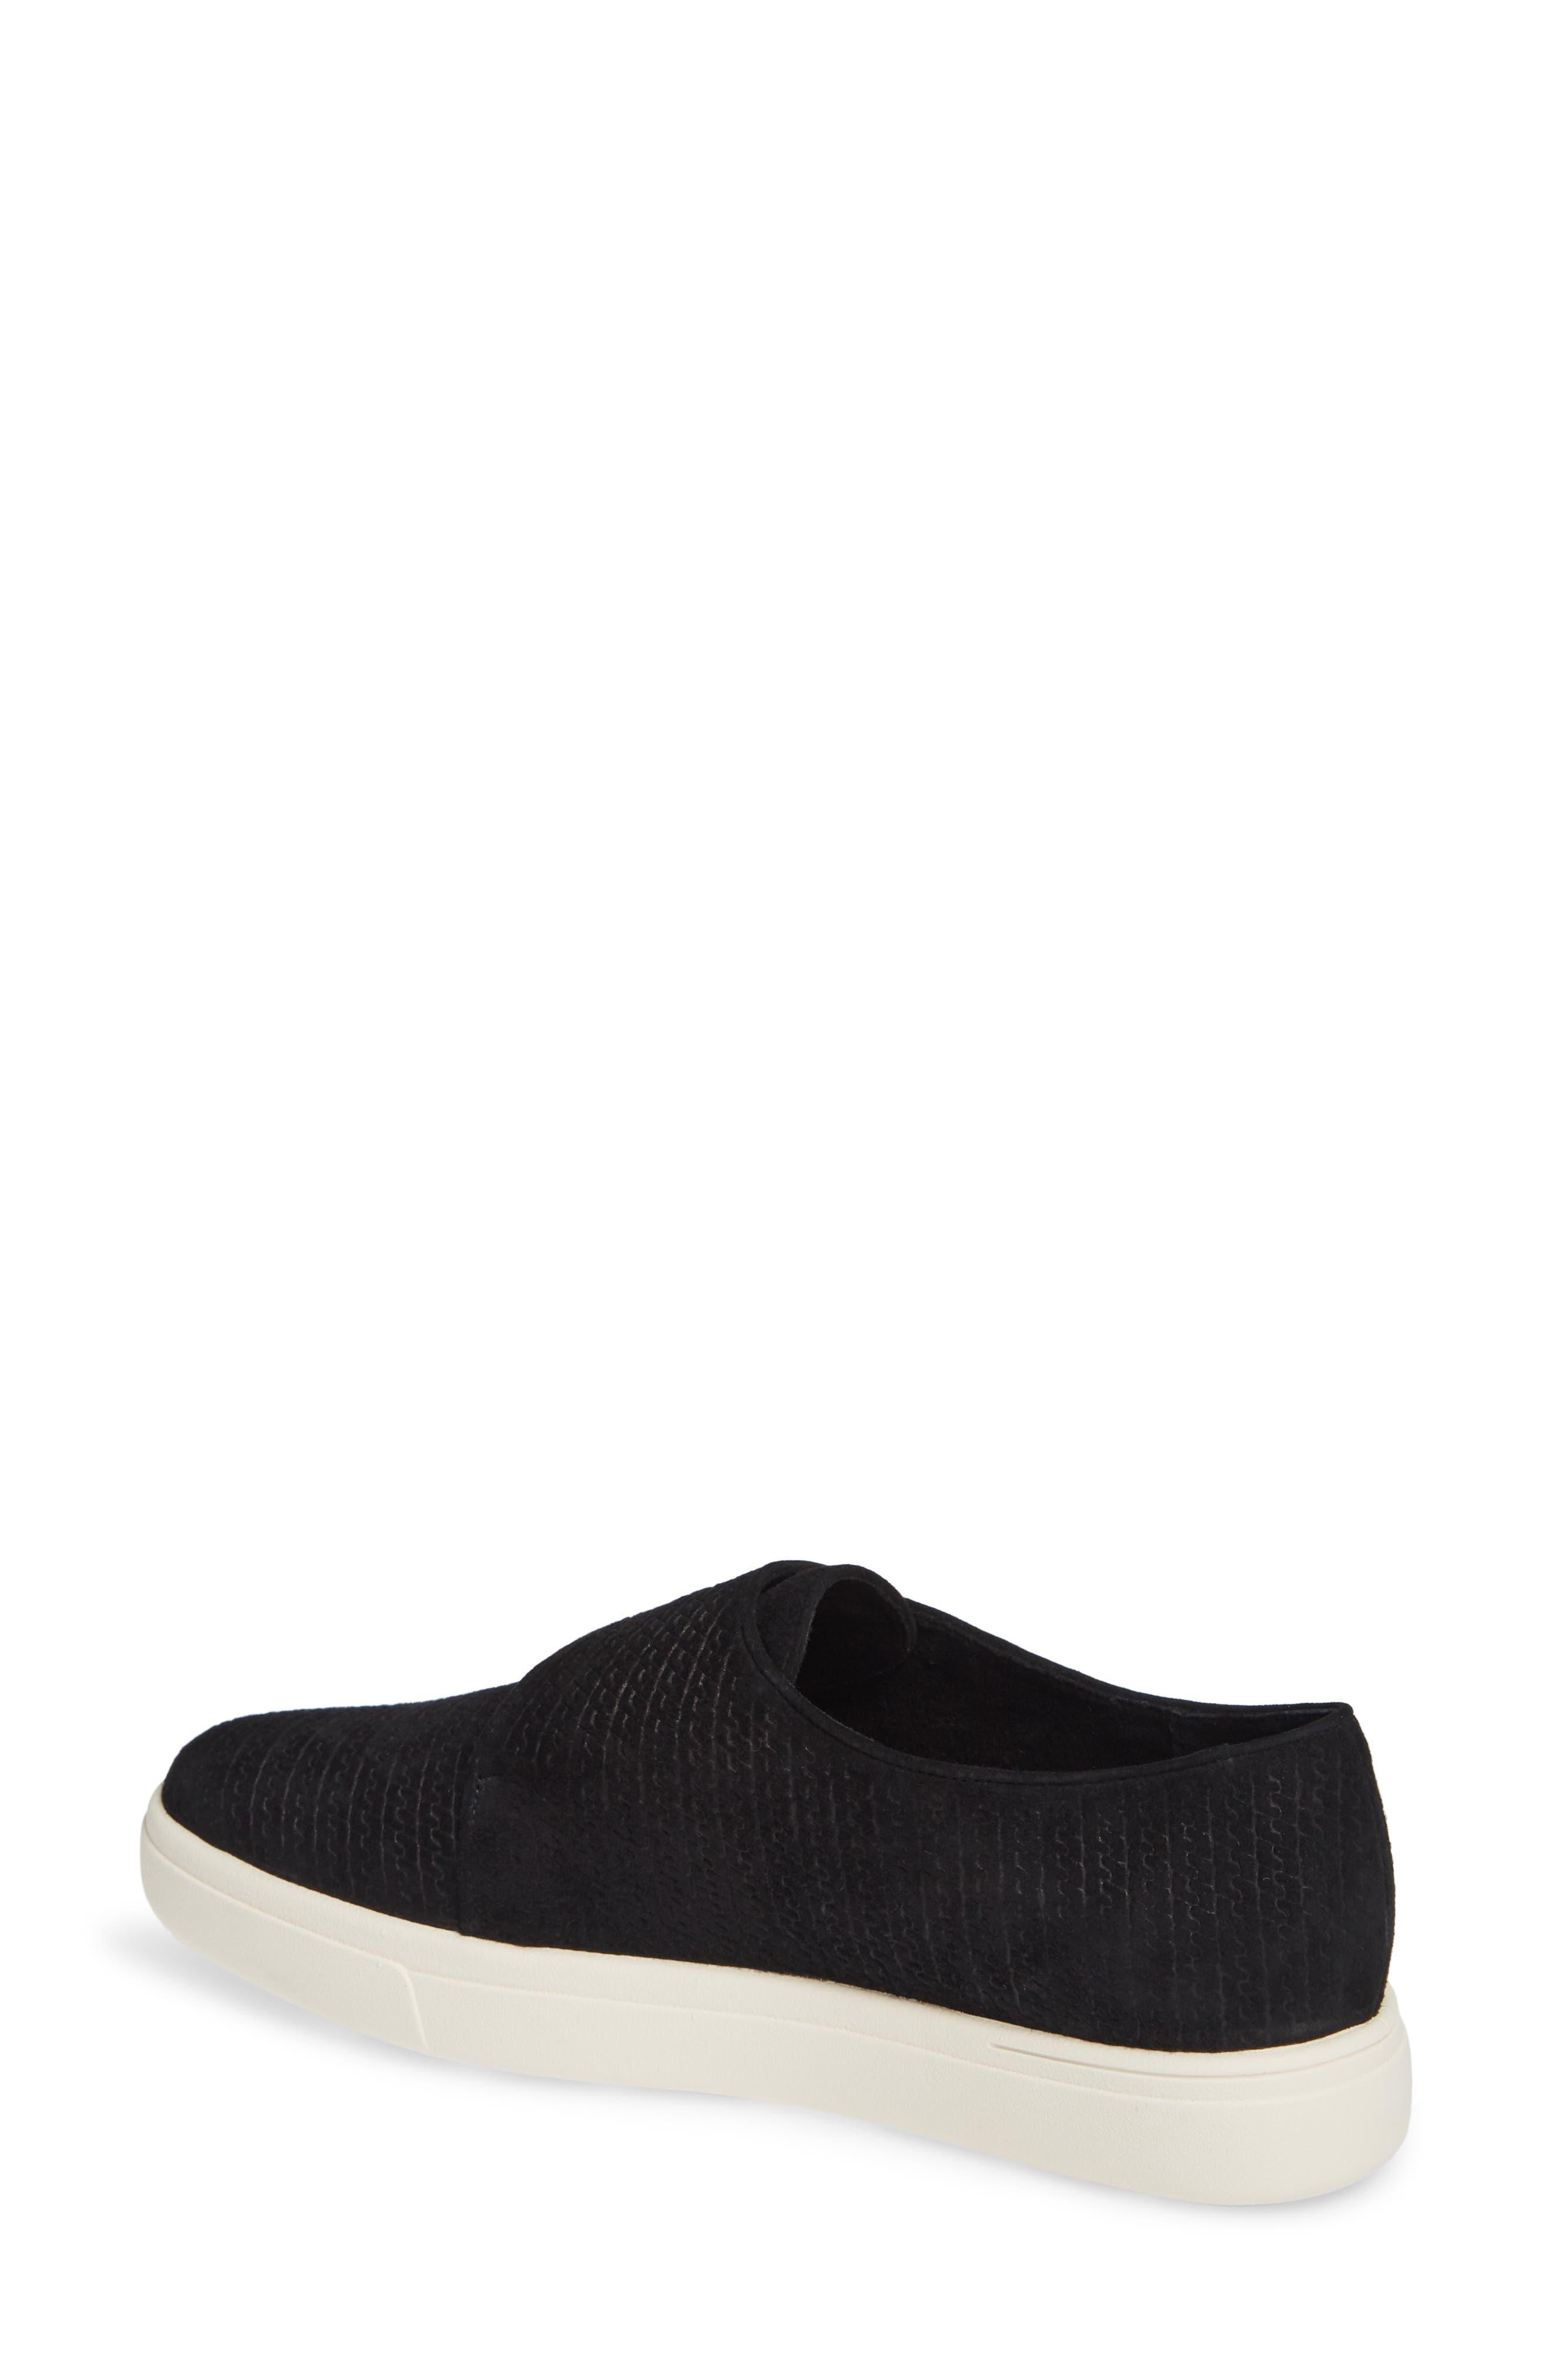 VANELI,                             Oberon Slip-On Sneaker,                             Alternate thumbnail 2, color,                             BLACK SUEDE